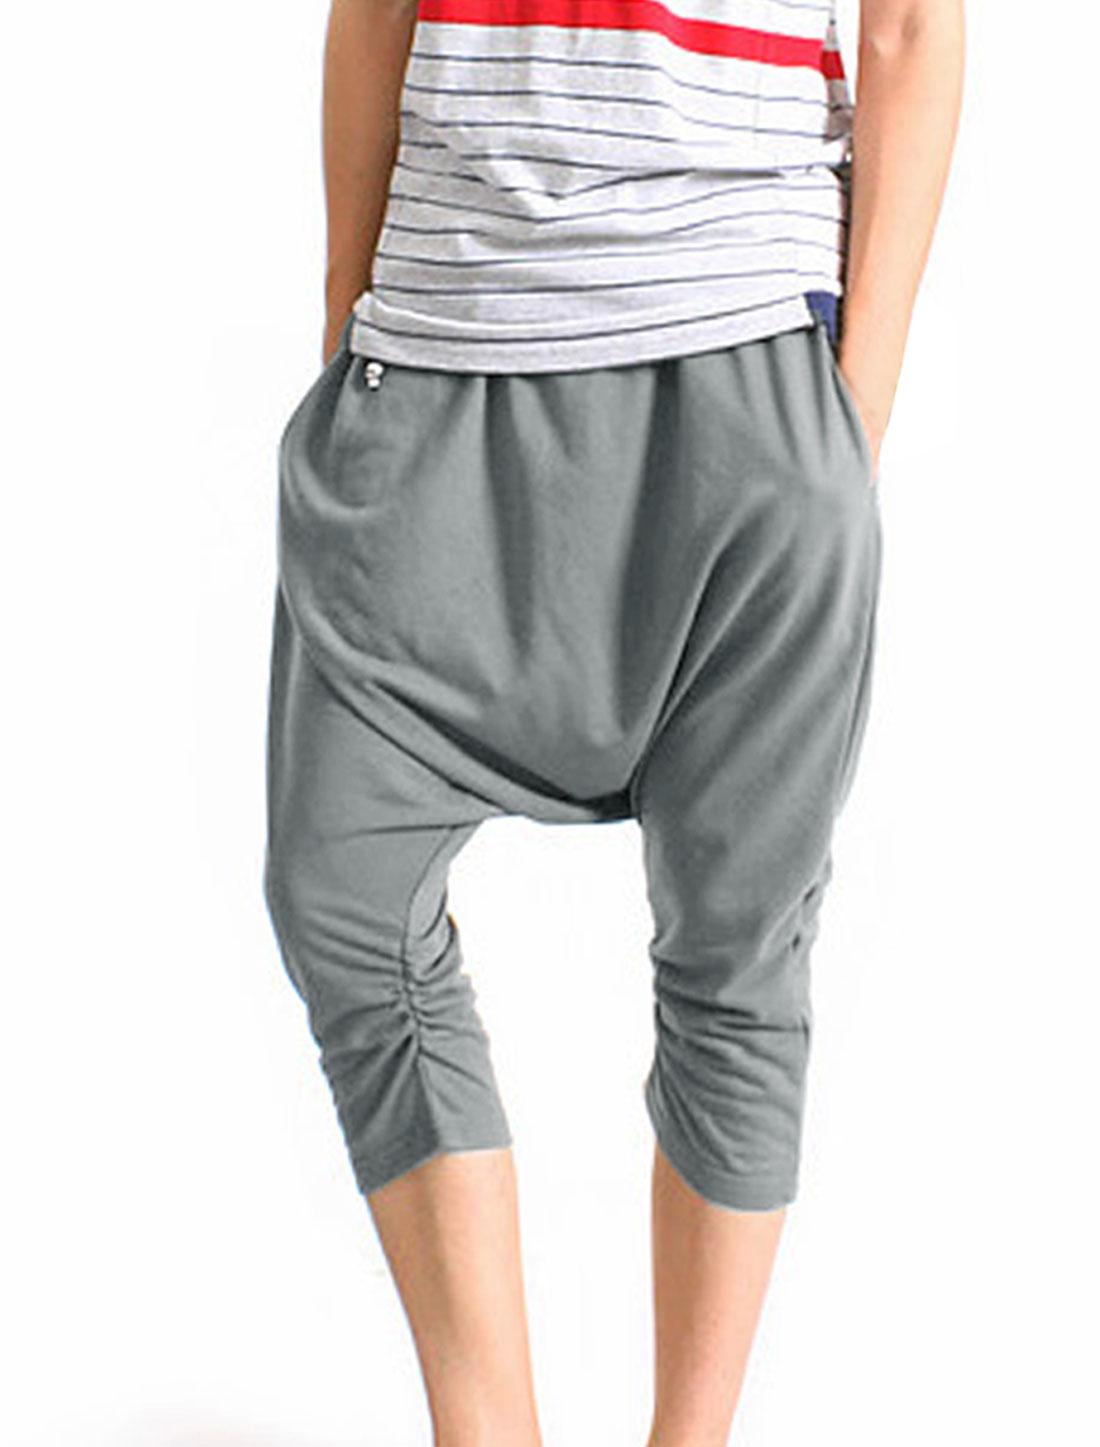 Men Ruched Detail Elastic Capris Harem Pants Gray W27